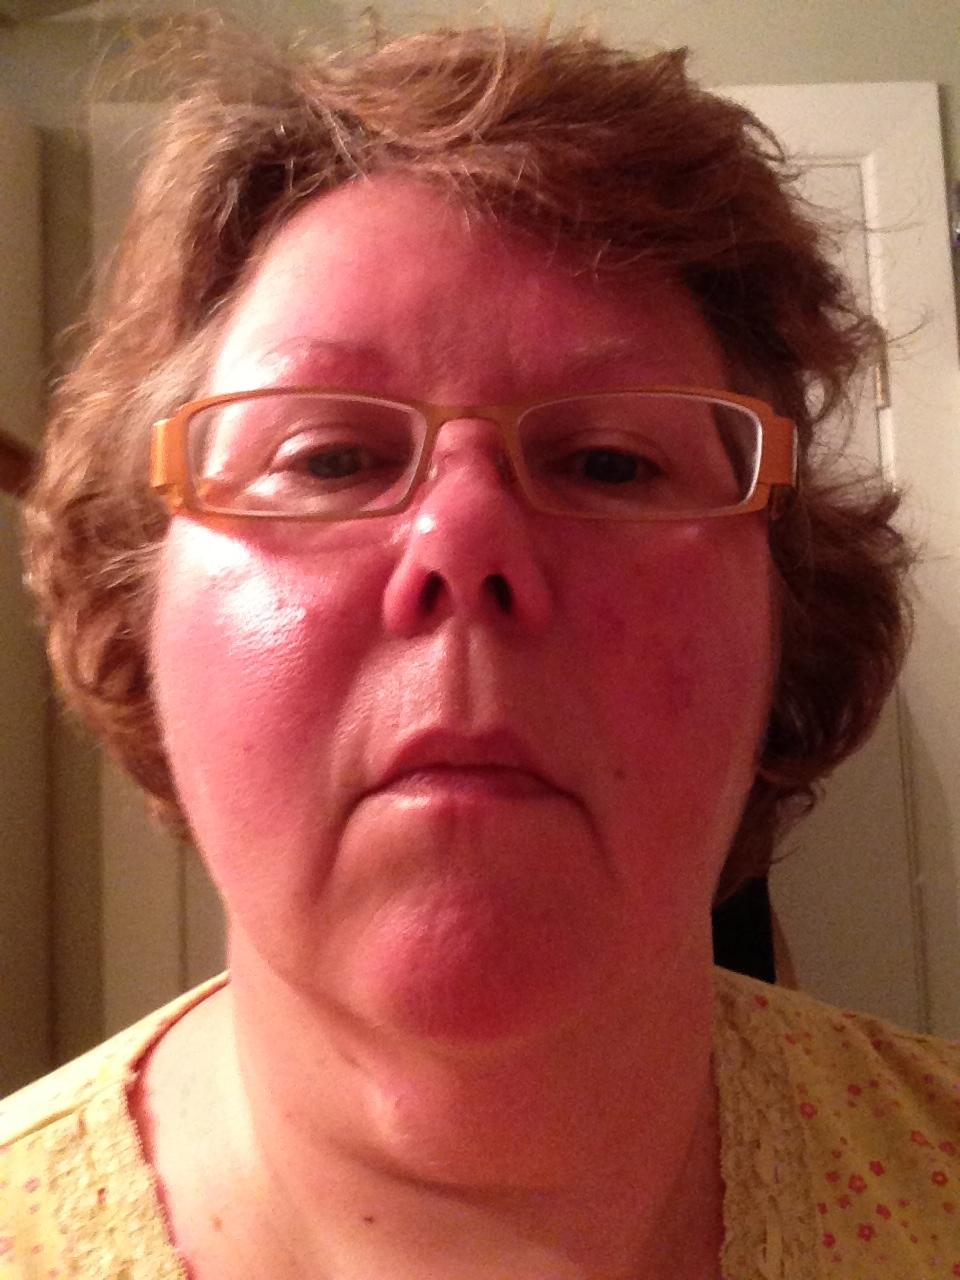 Cialis side effects facial flushing